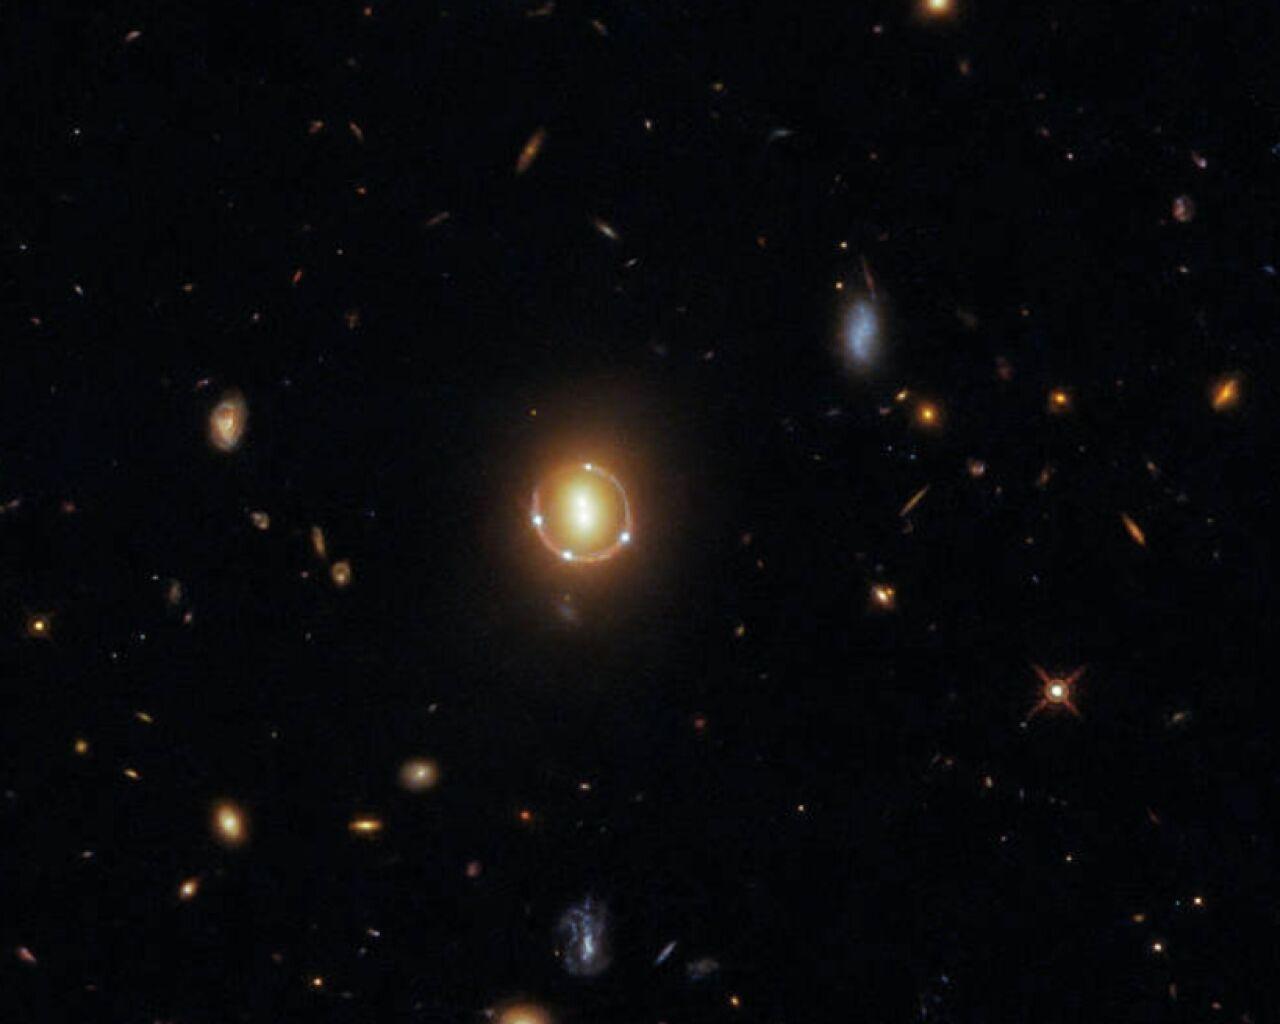 planeta nueve sistema solar cientificos objetos.jpg